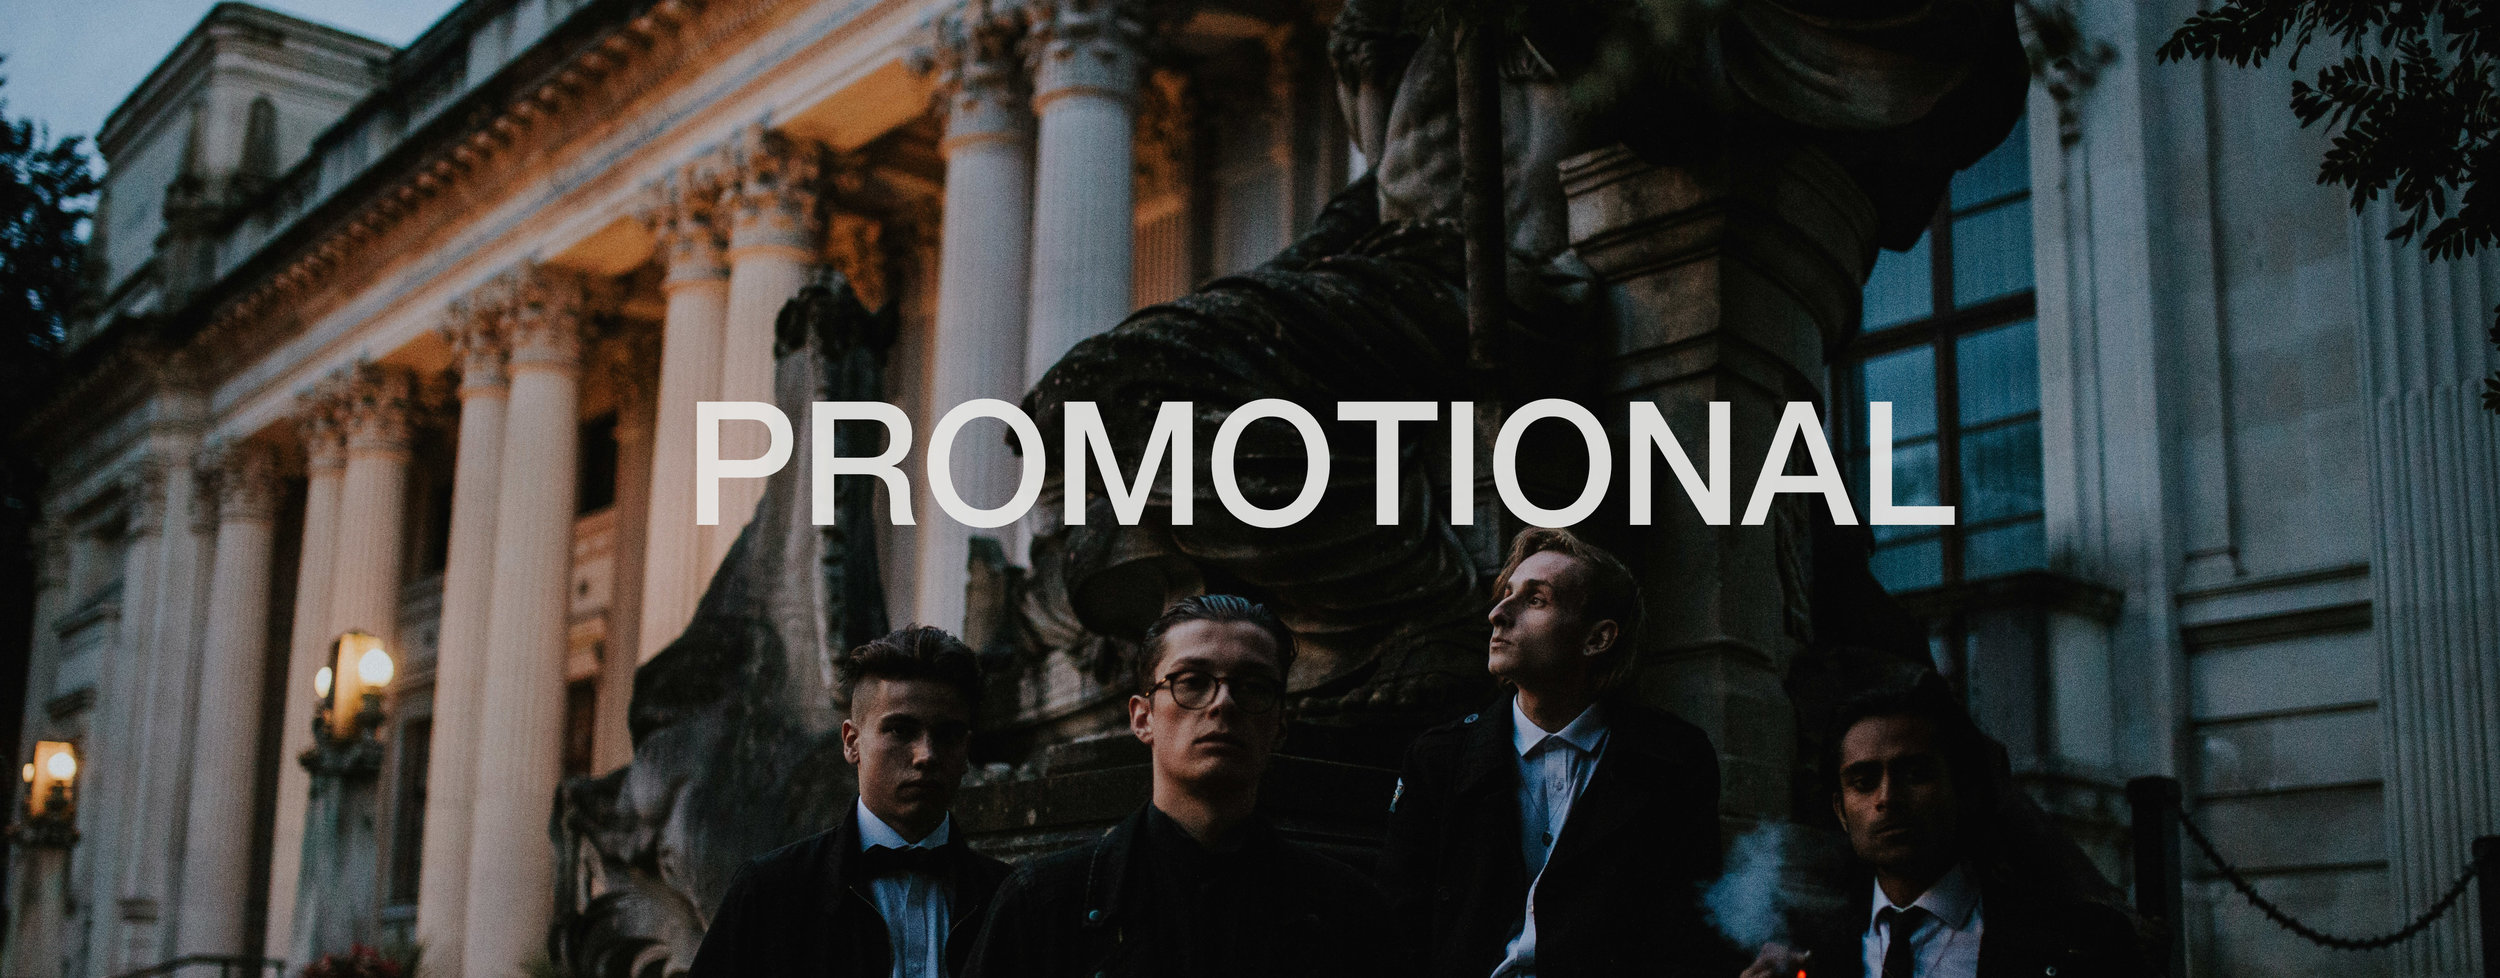 Promo.jpg